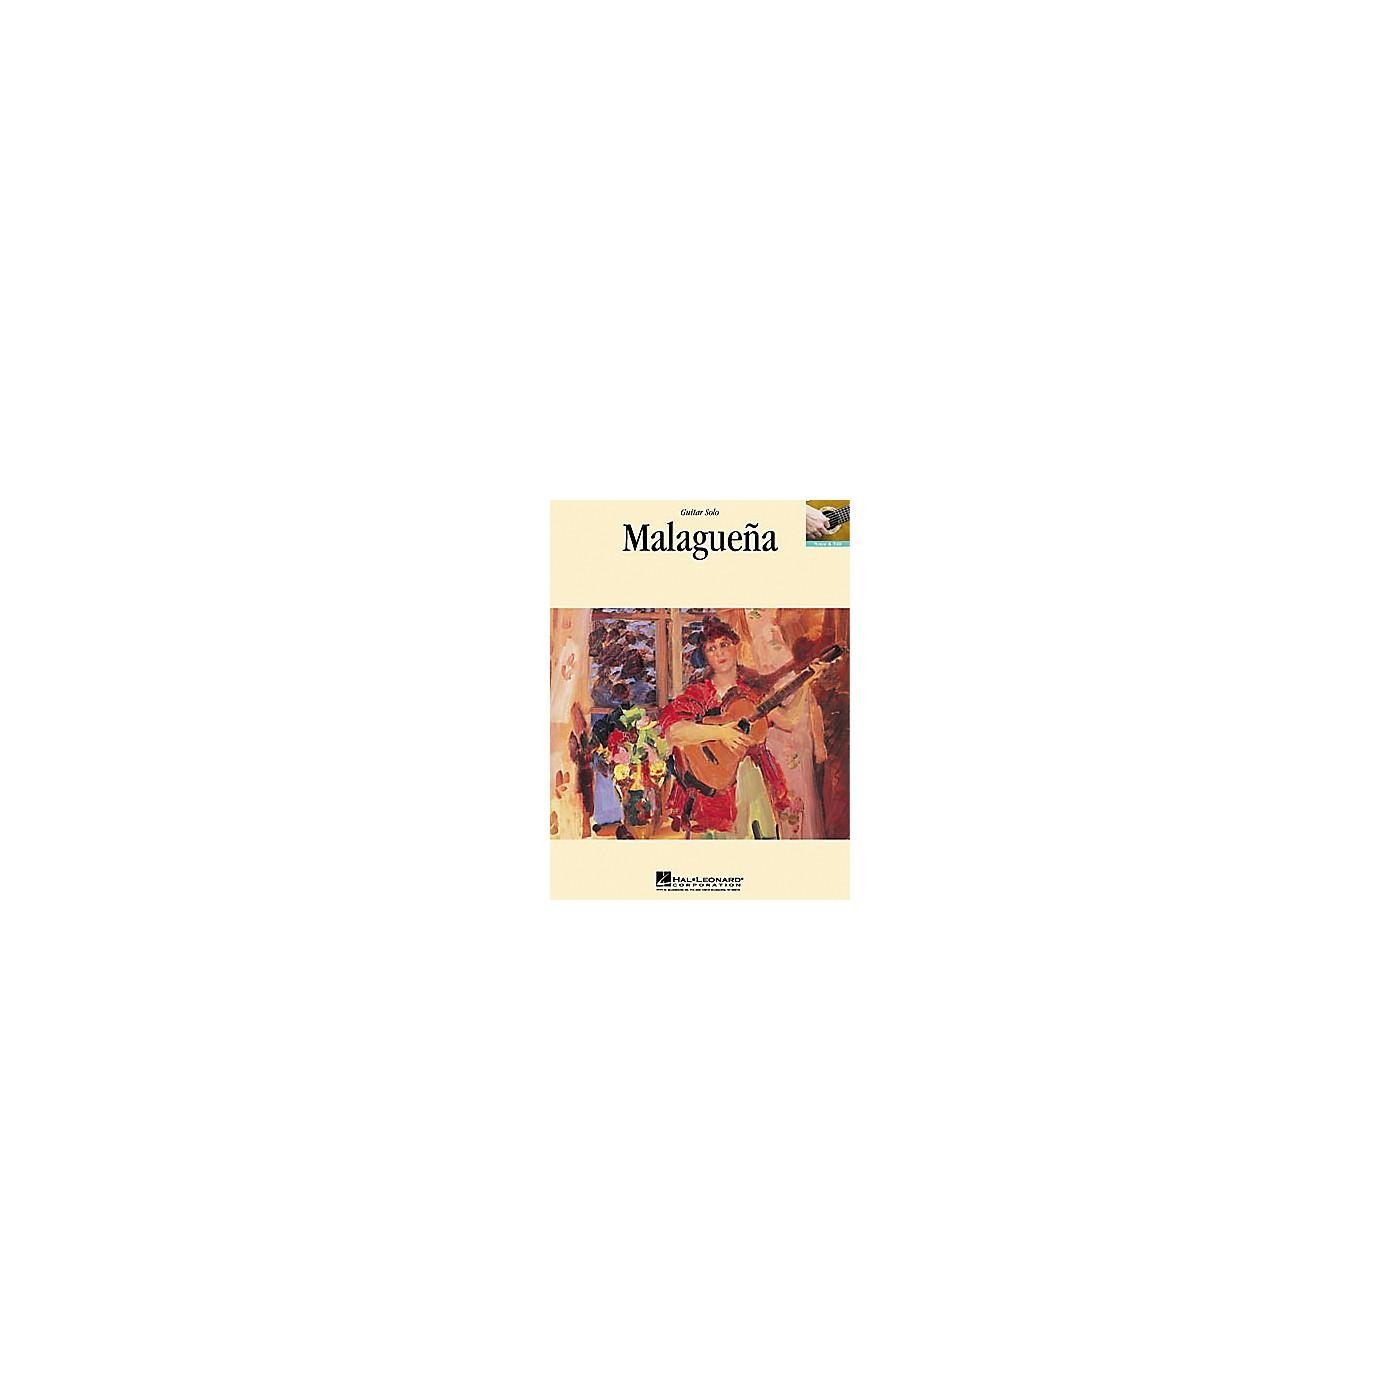 Hal Leonard Malaguena Guitar Tab Sheet Music Book thumbnail